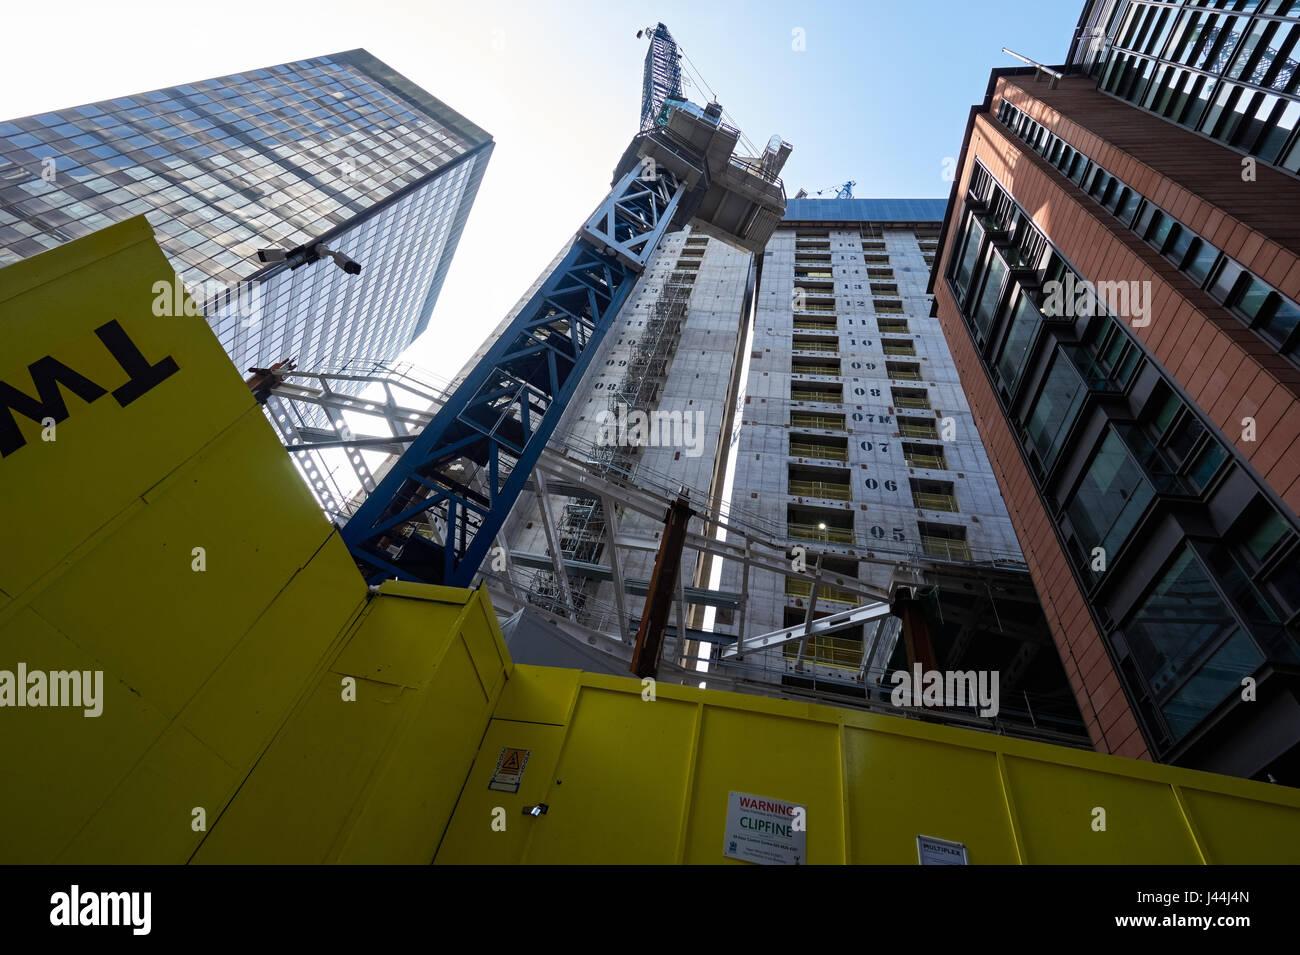 The Pinnacle skyscraper 22 Bishopsgate under construction, London England UK - Stock Image